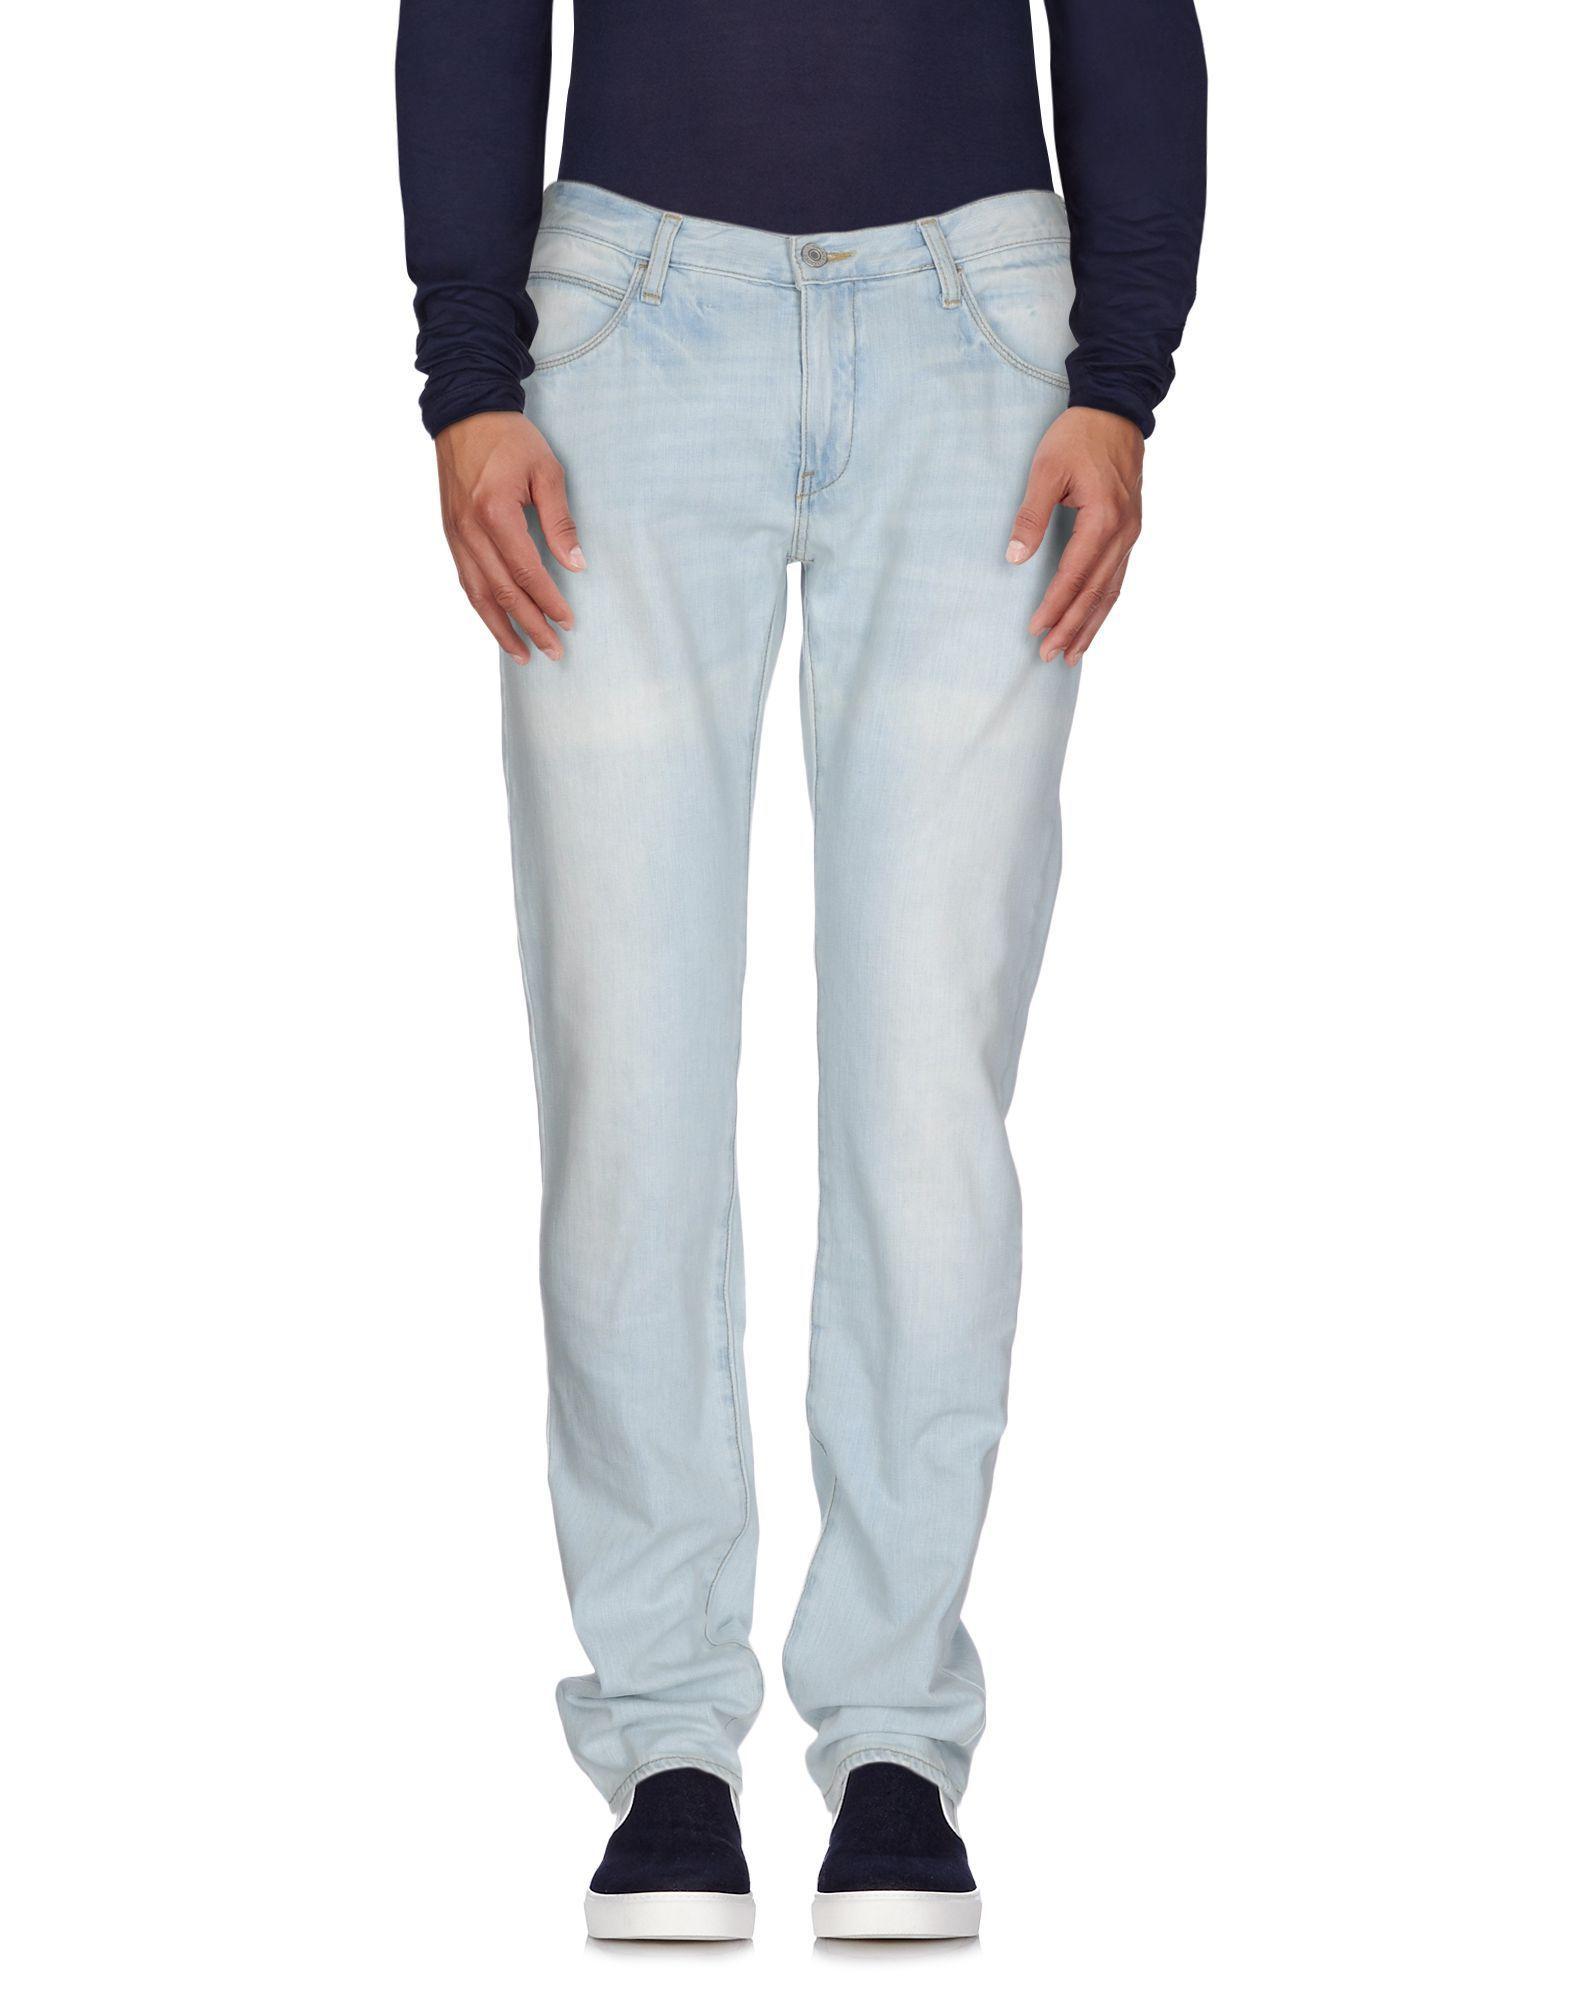 2d9ea737f3 ARMANI JEANS DENIM Τζιν  joy  style  fashion